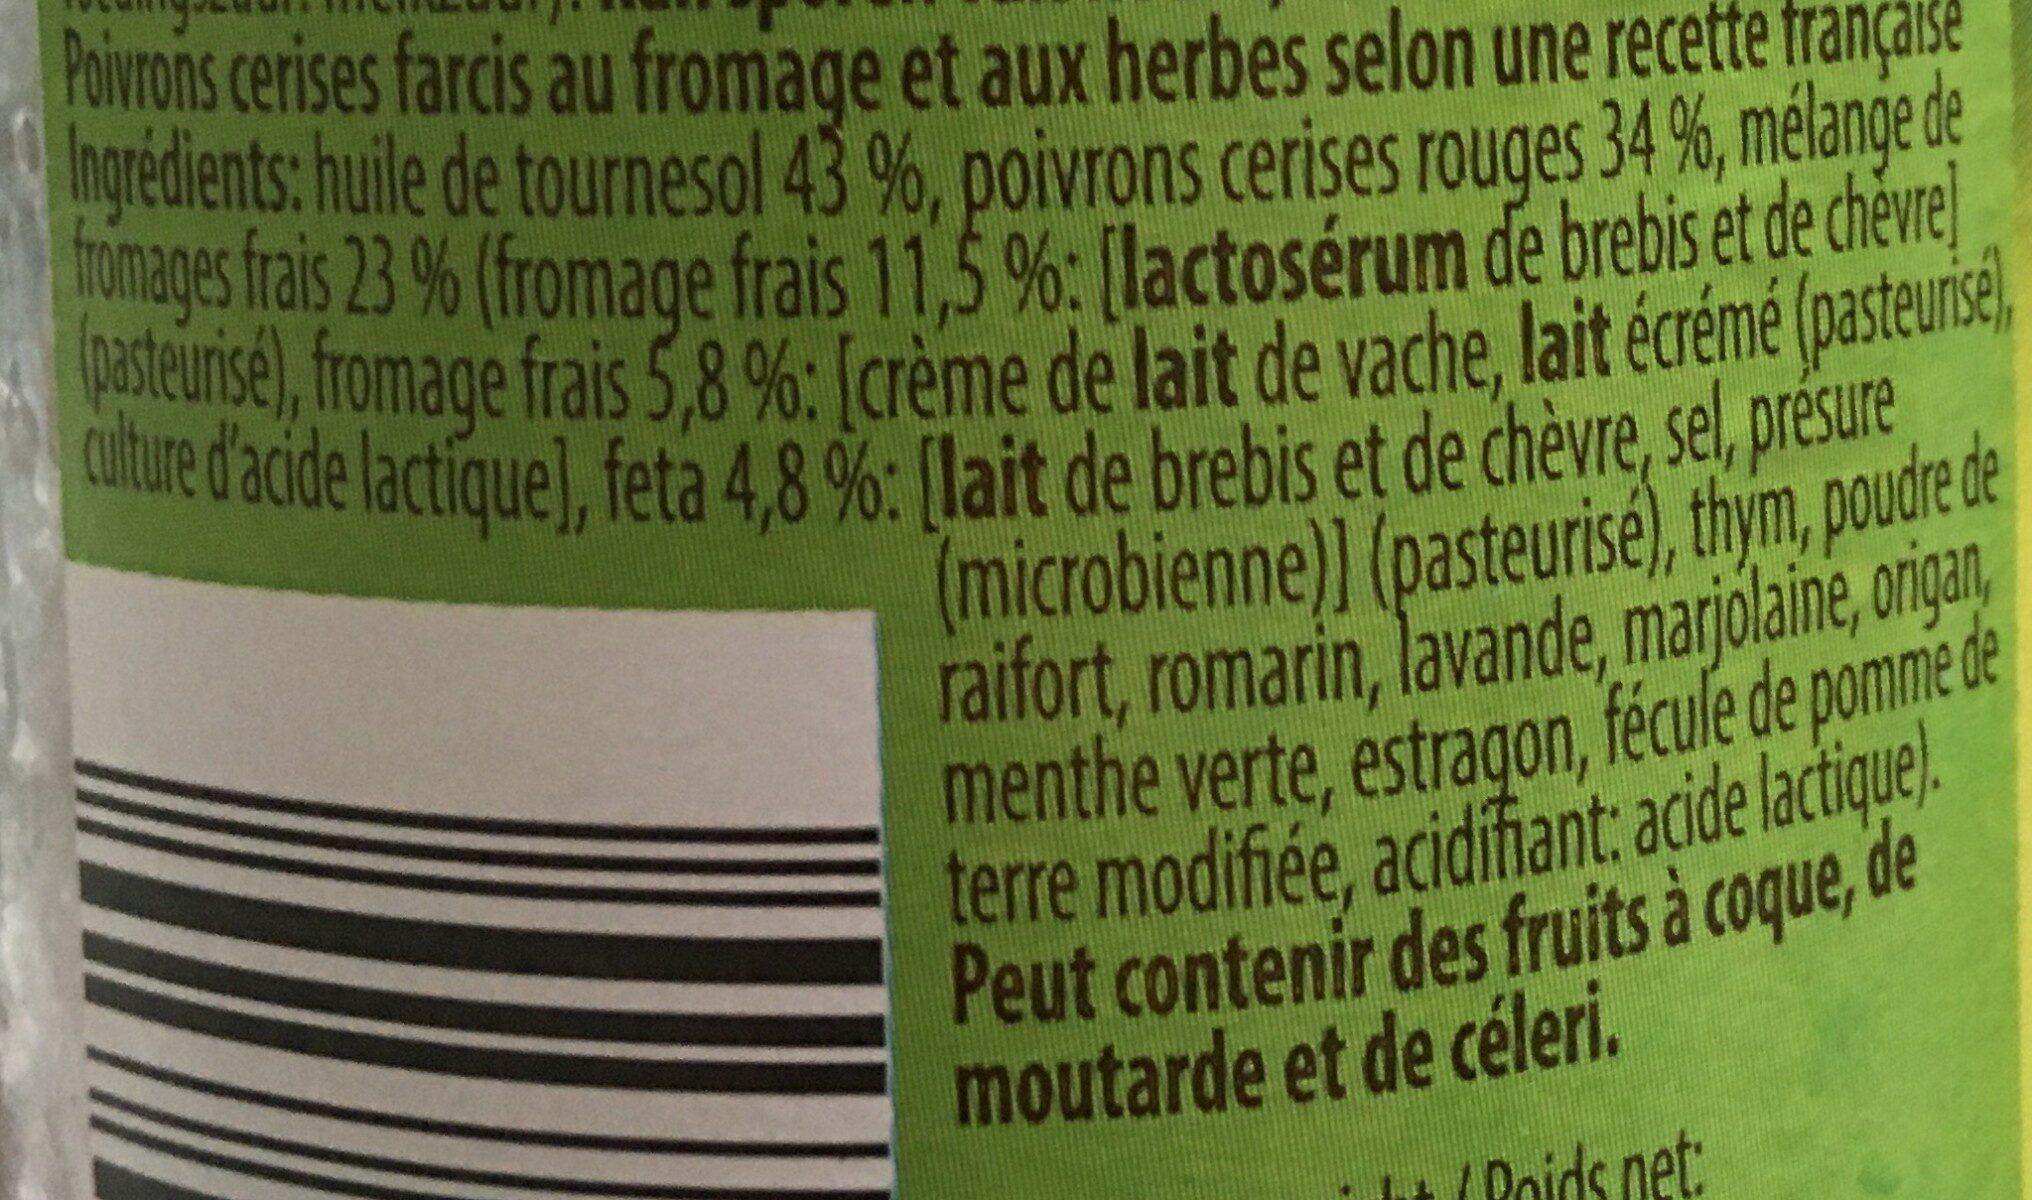 Poivrons cerises - Ingrediënten - fr